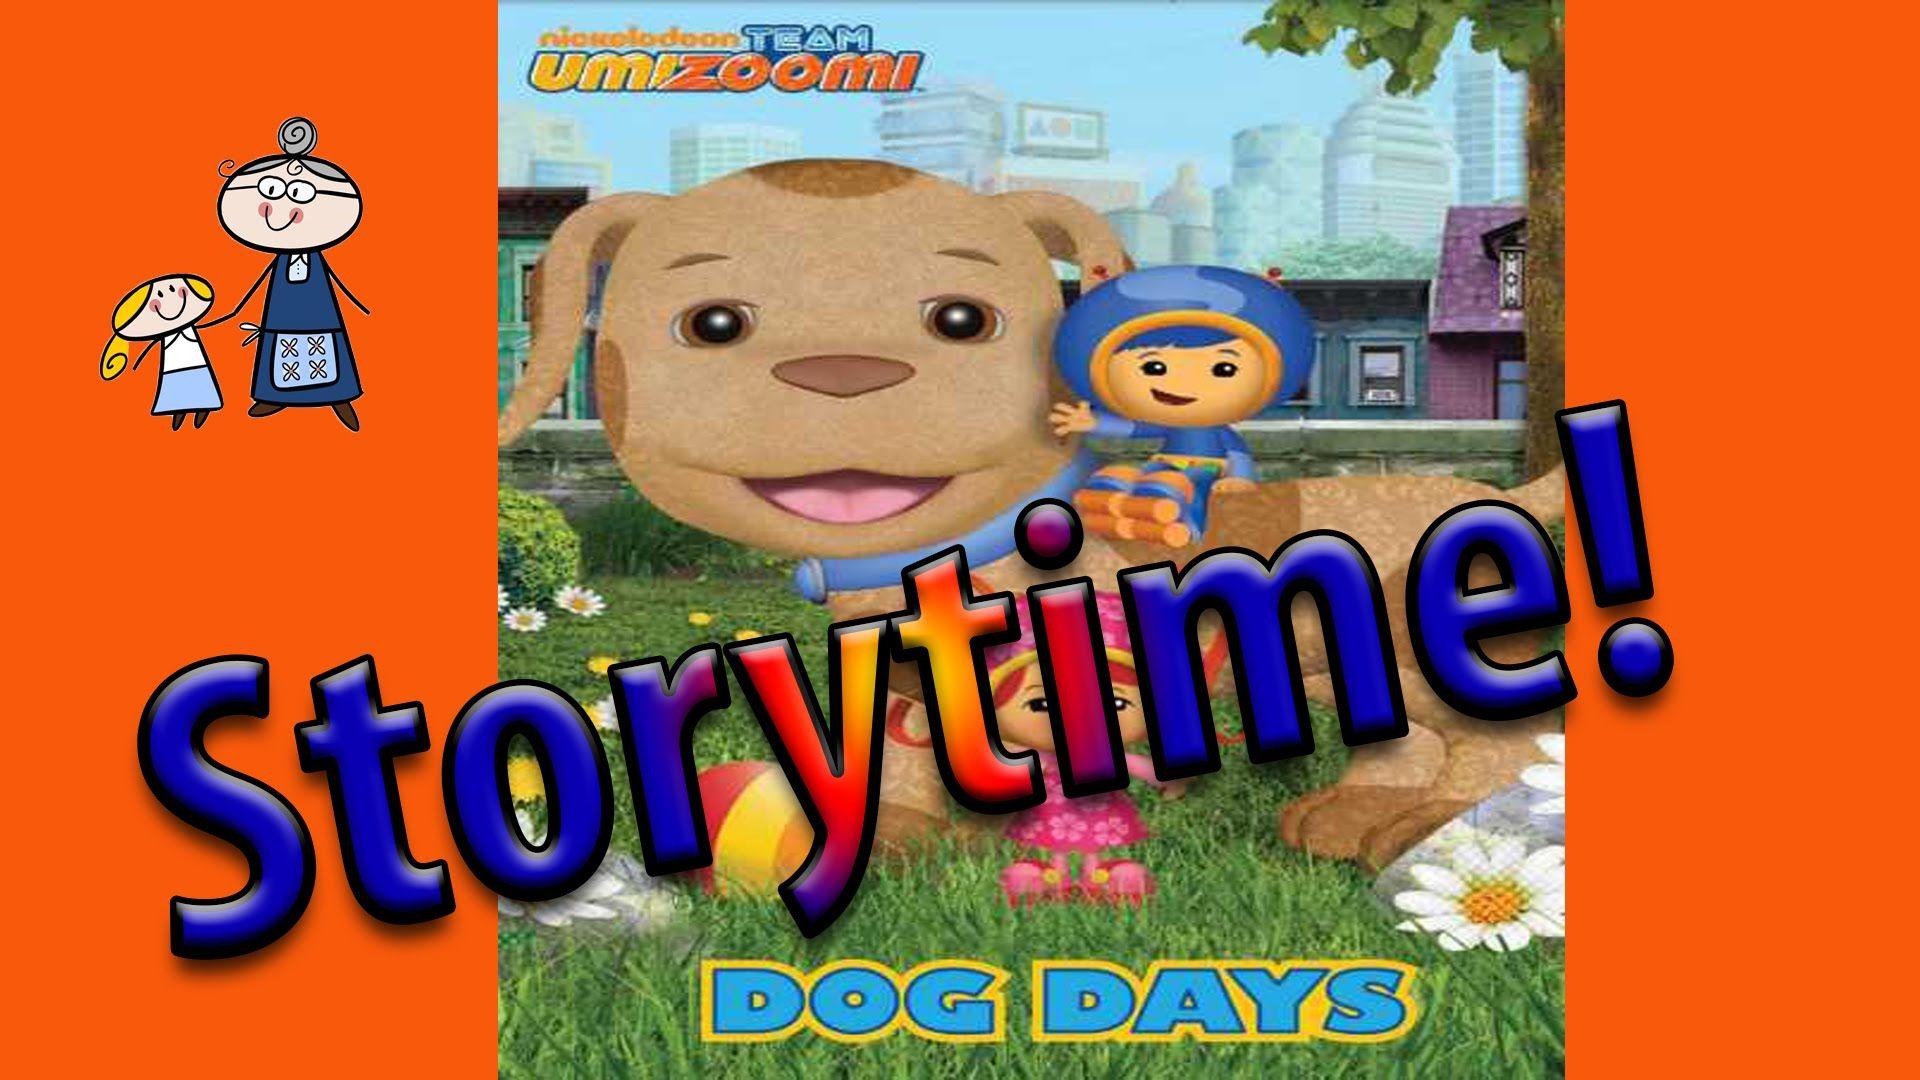 Storytime Team Umizoomi Dog Days Read Along Story